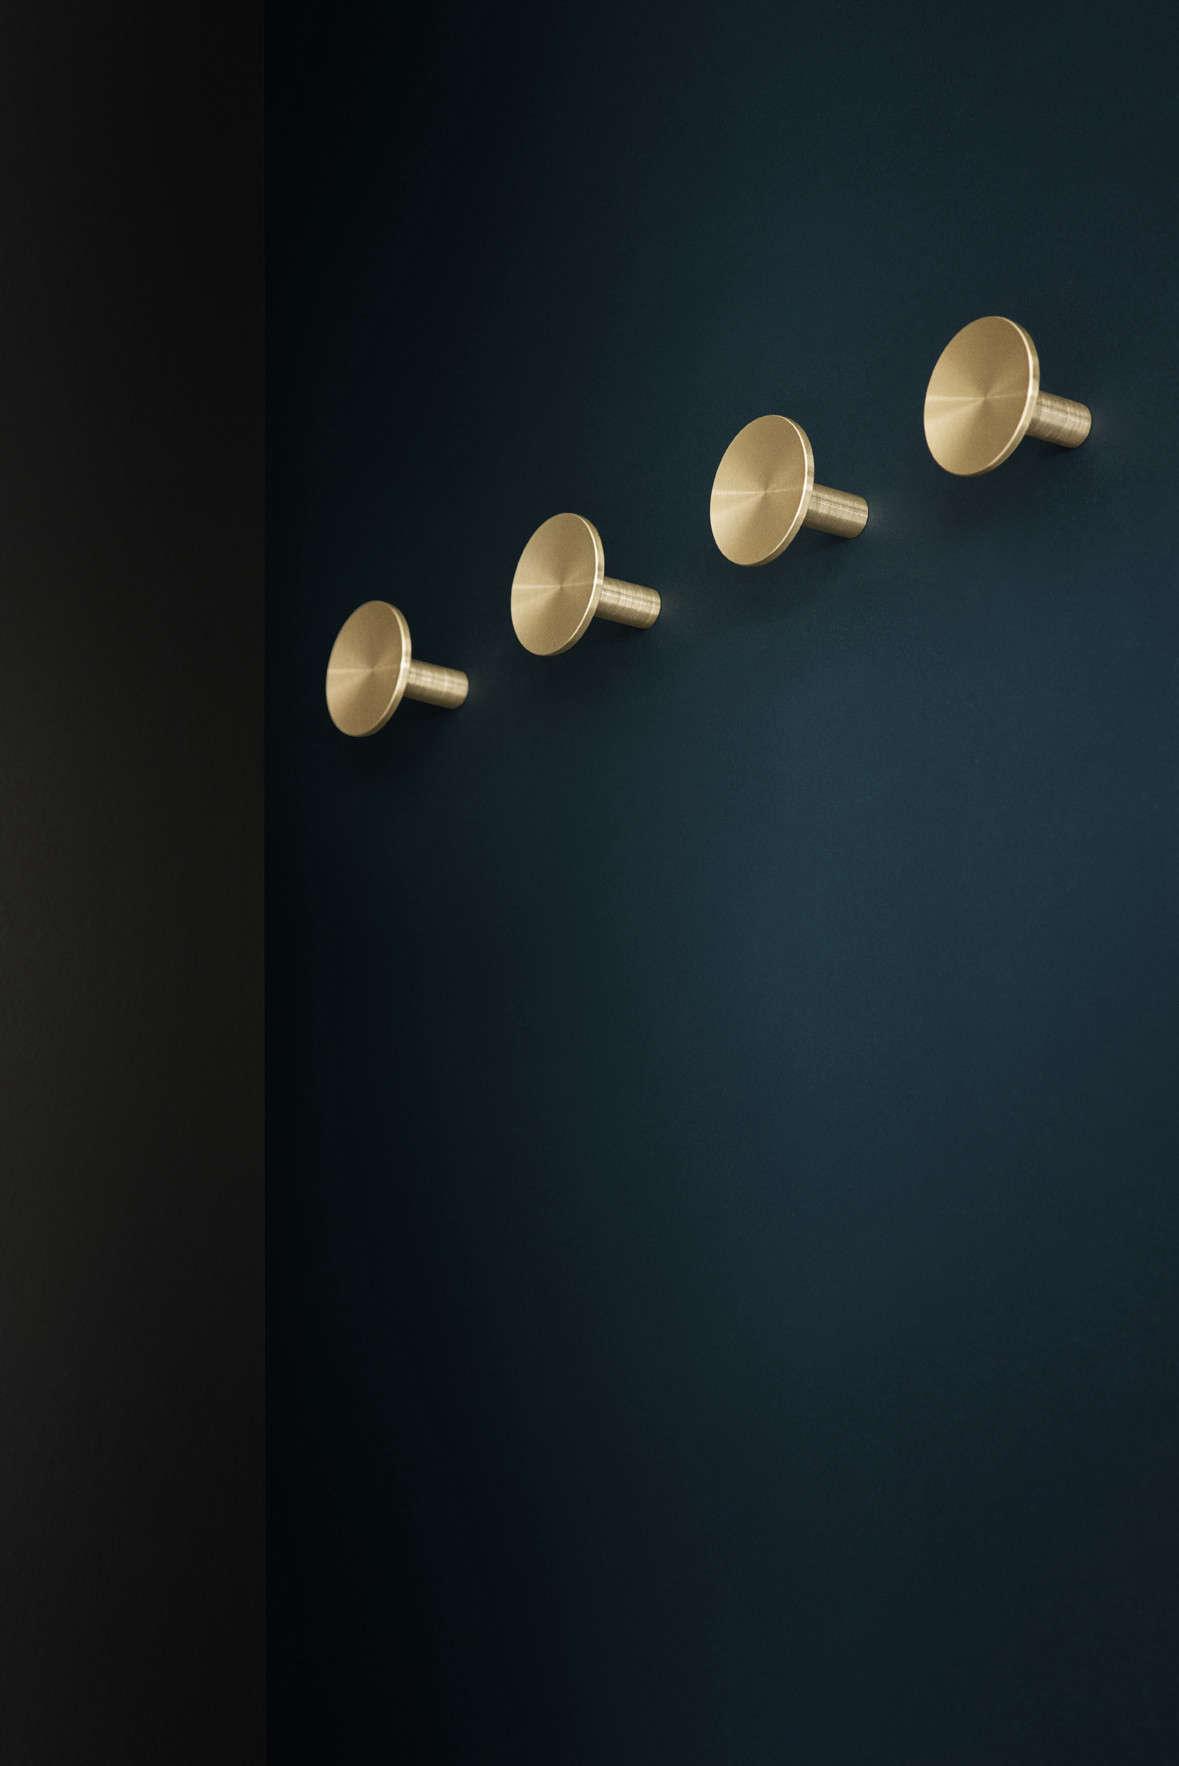 ArtisanDesigned Light Fixtures and Hardware from Copenhagen KBH brass knob remodelista